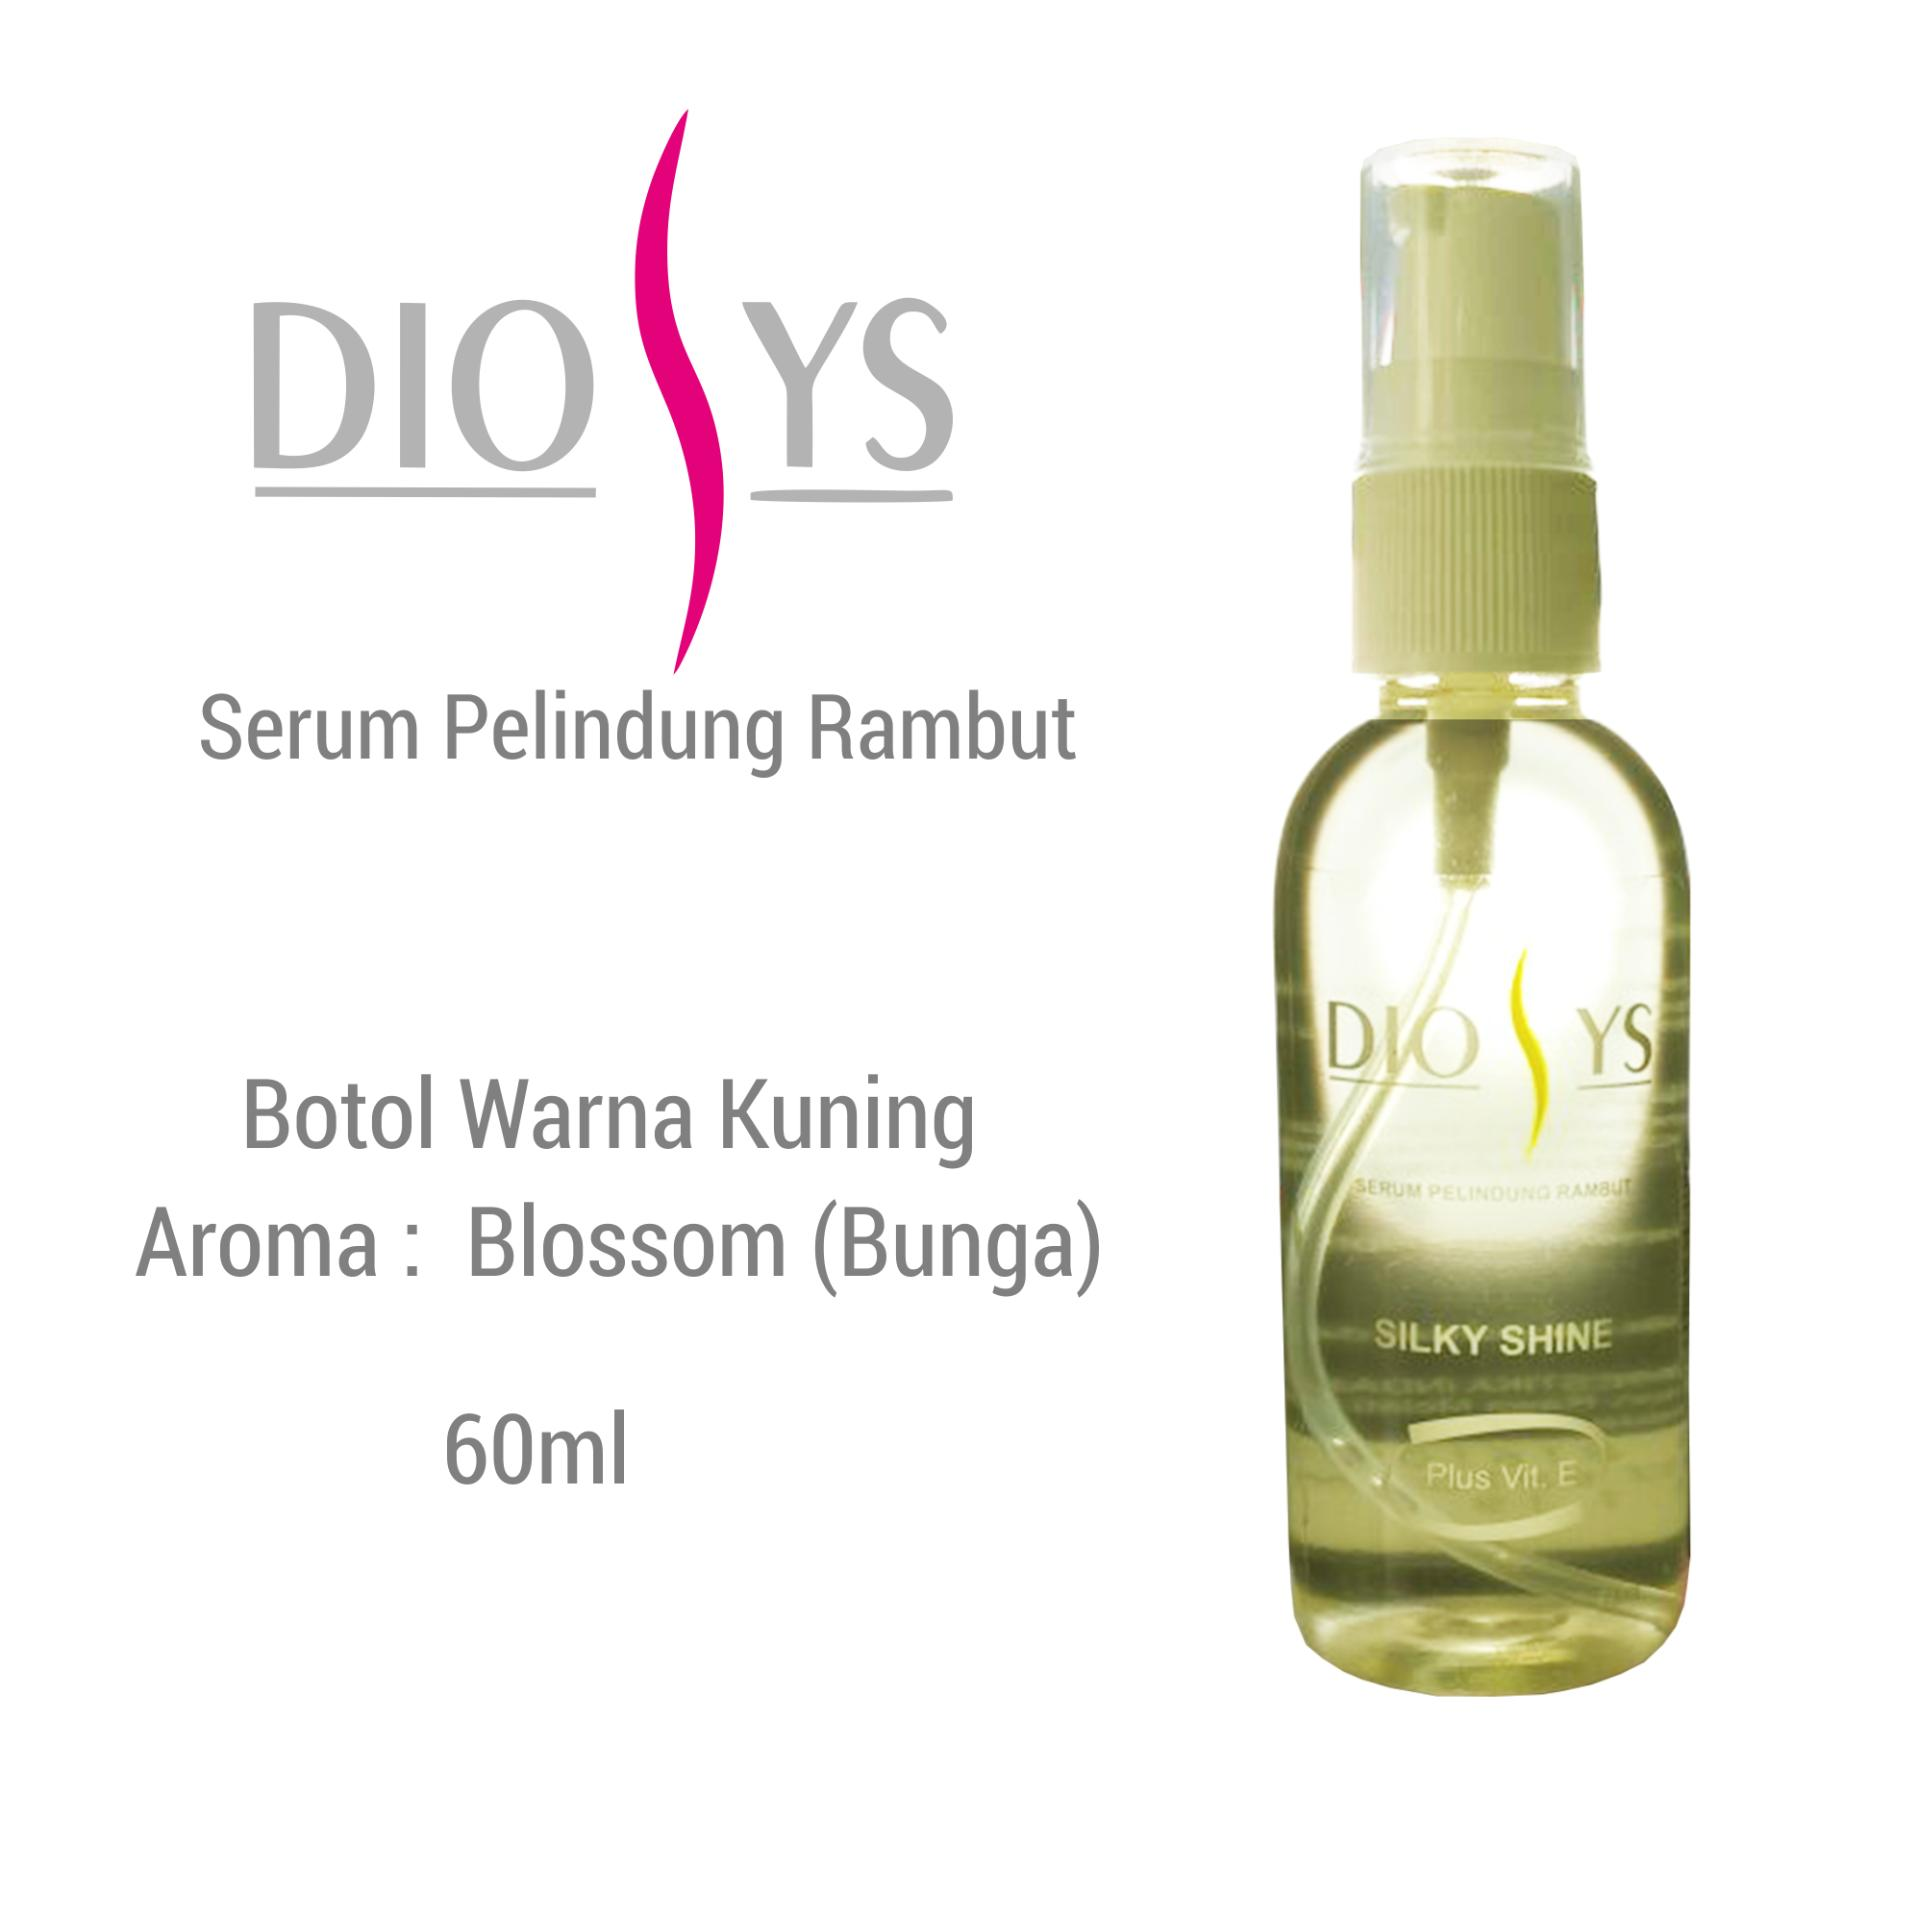 Online Murah Diosys Serum Vitamin Pelindung Rambut Terbaik Masa Matrix Biolage Deep Smoothing Kini